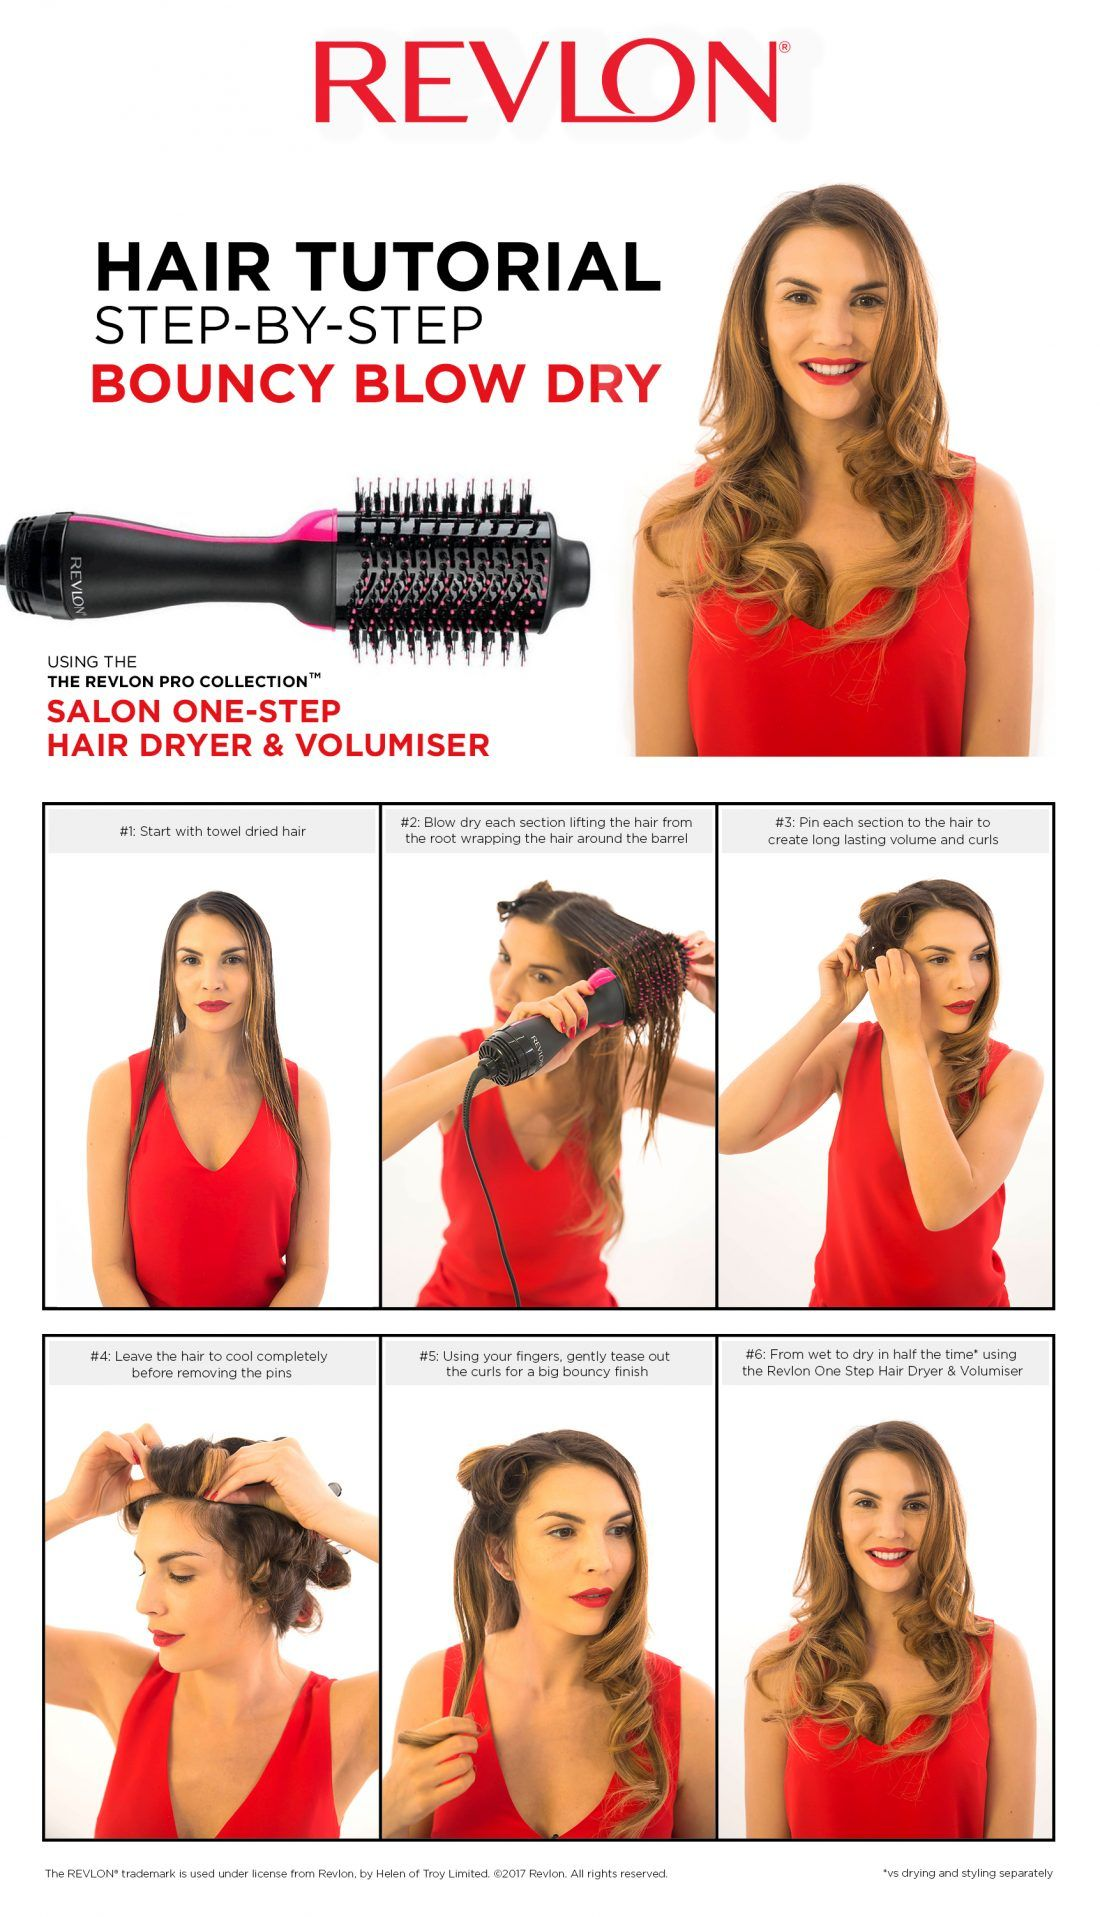 Ad revlon salon one step hair dryer volumiser hair